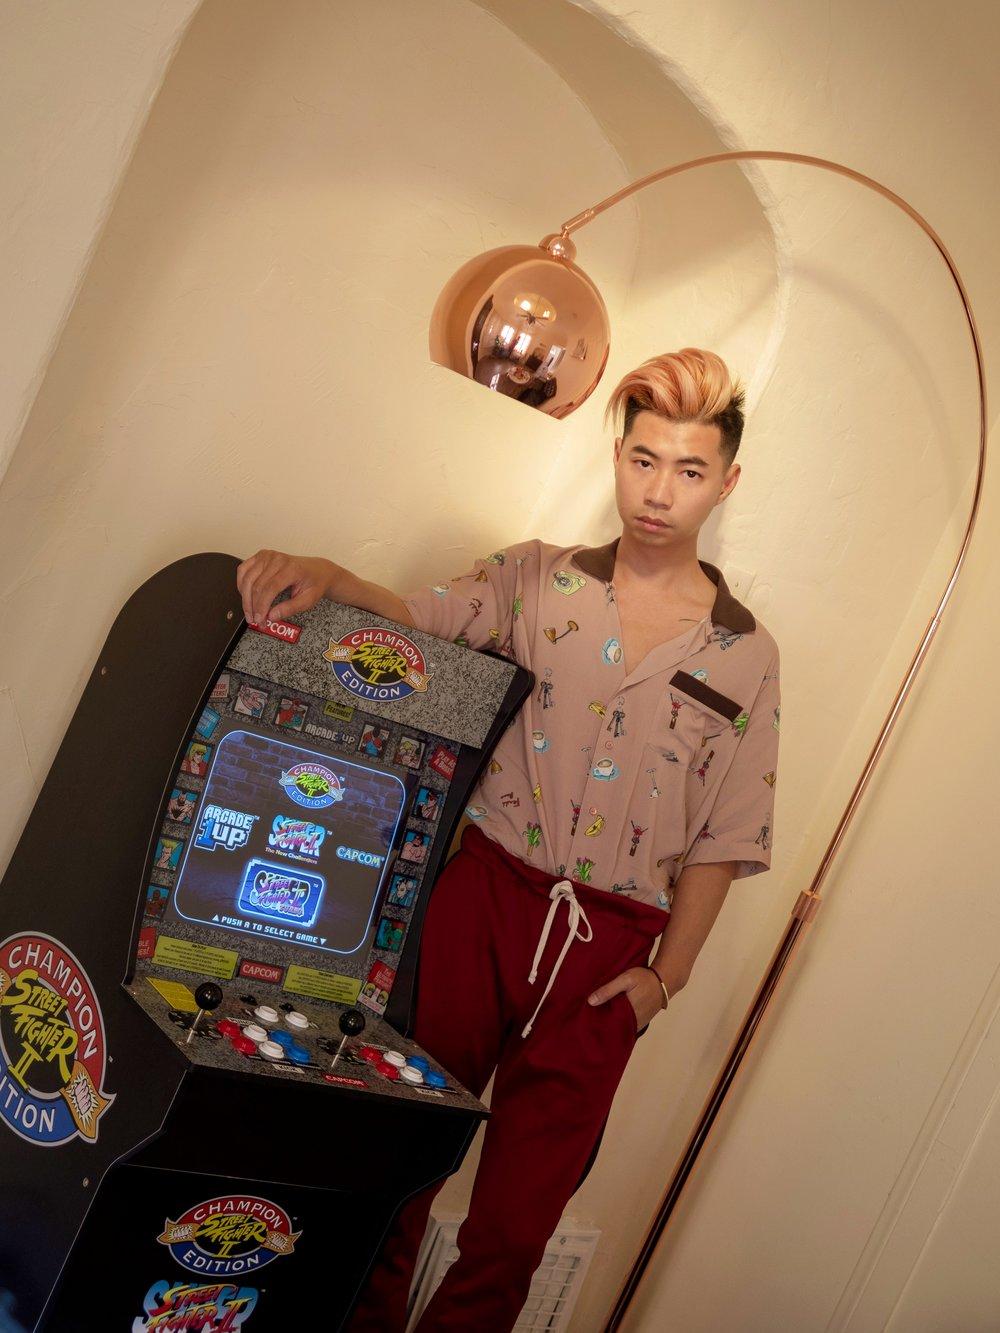 mybelonging-tommylei-walmart-retro-arcade-old-hong-kong-arcades19.jpg